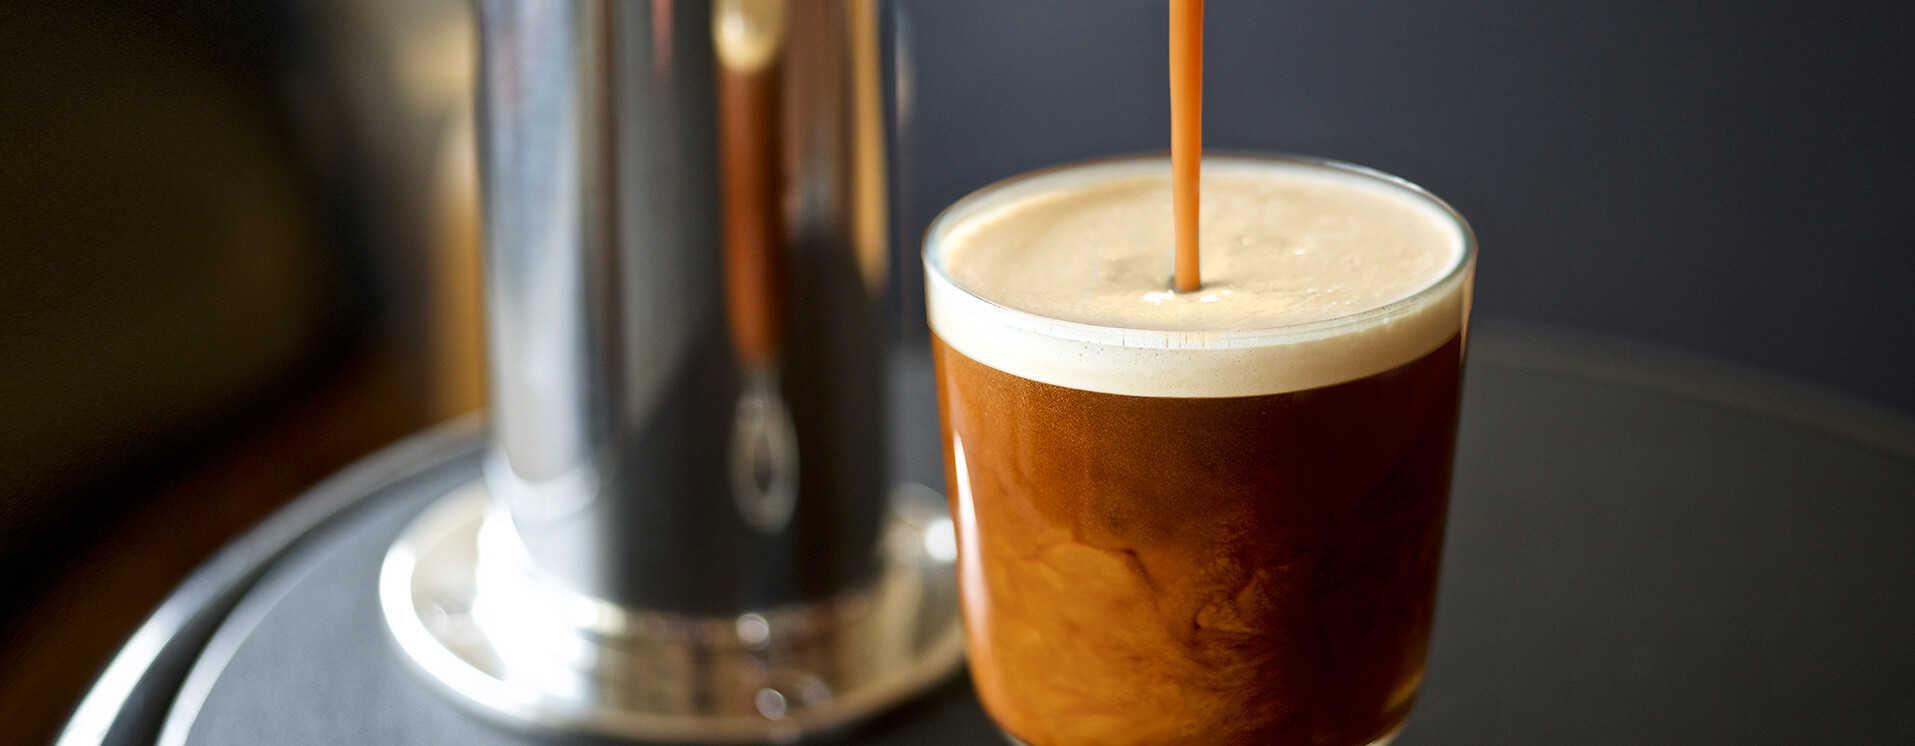 nitro-brew-coffee